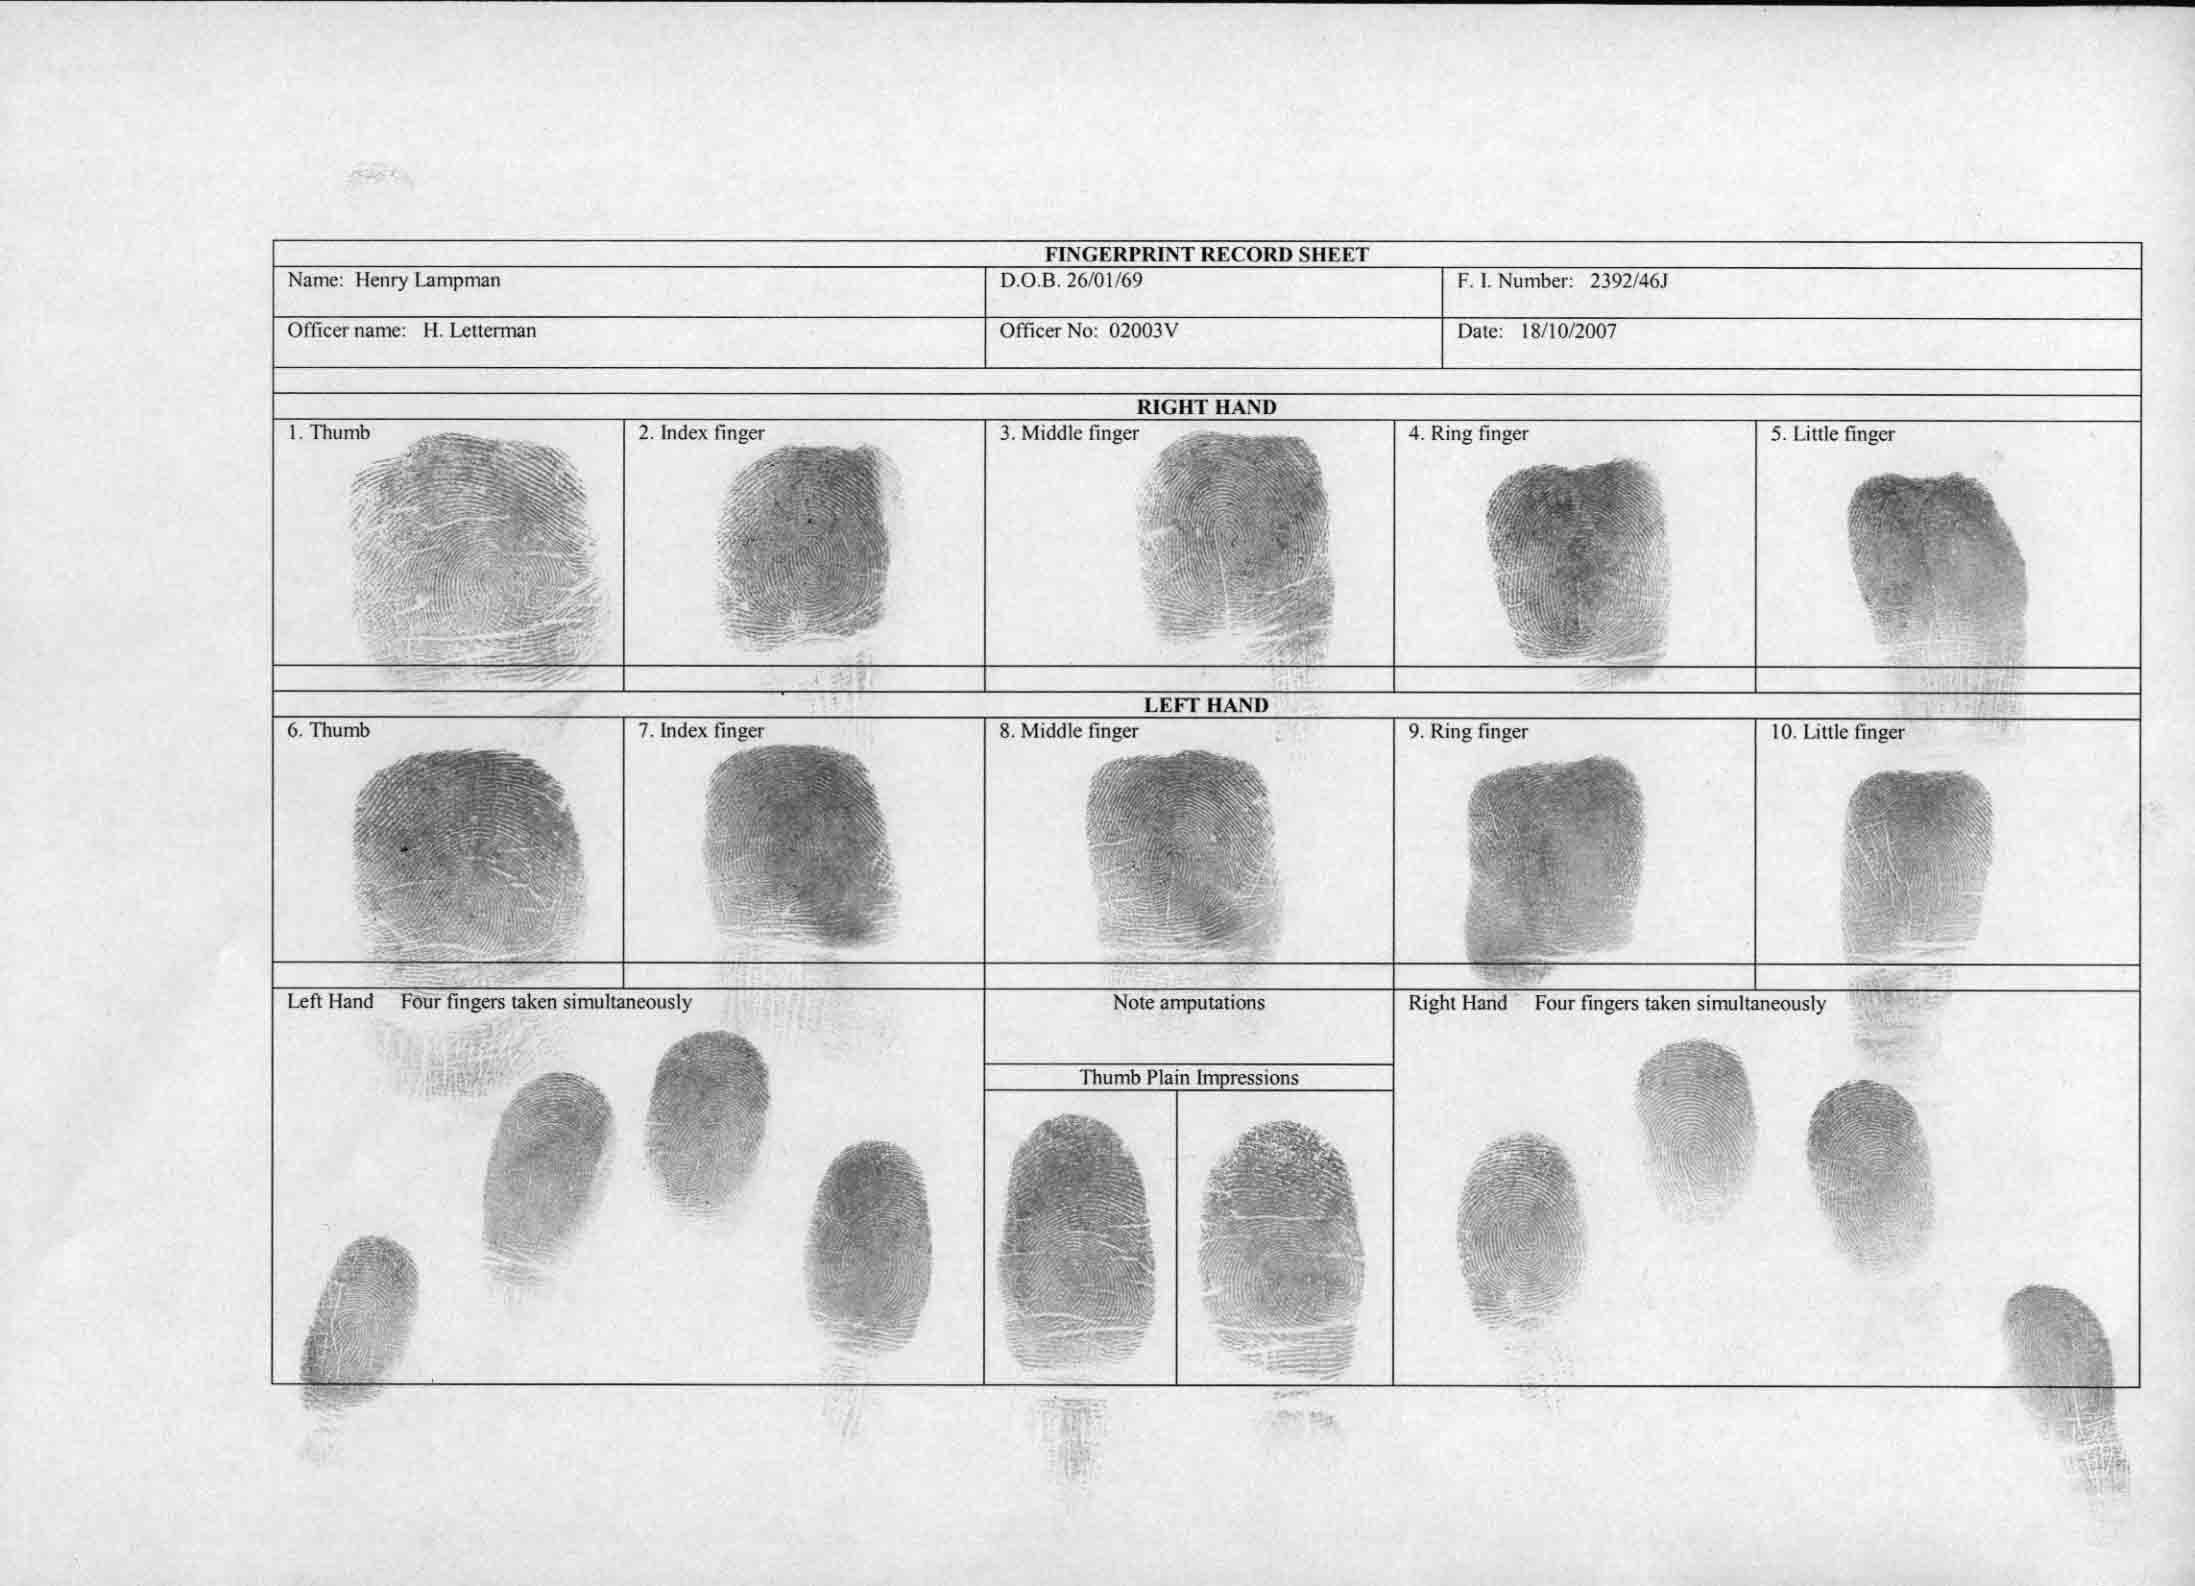 Suspects And Fingerprints